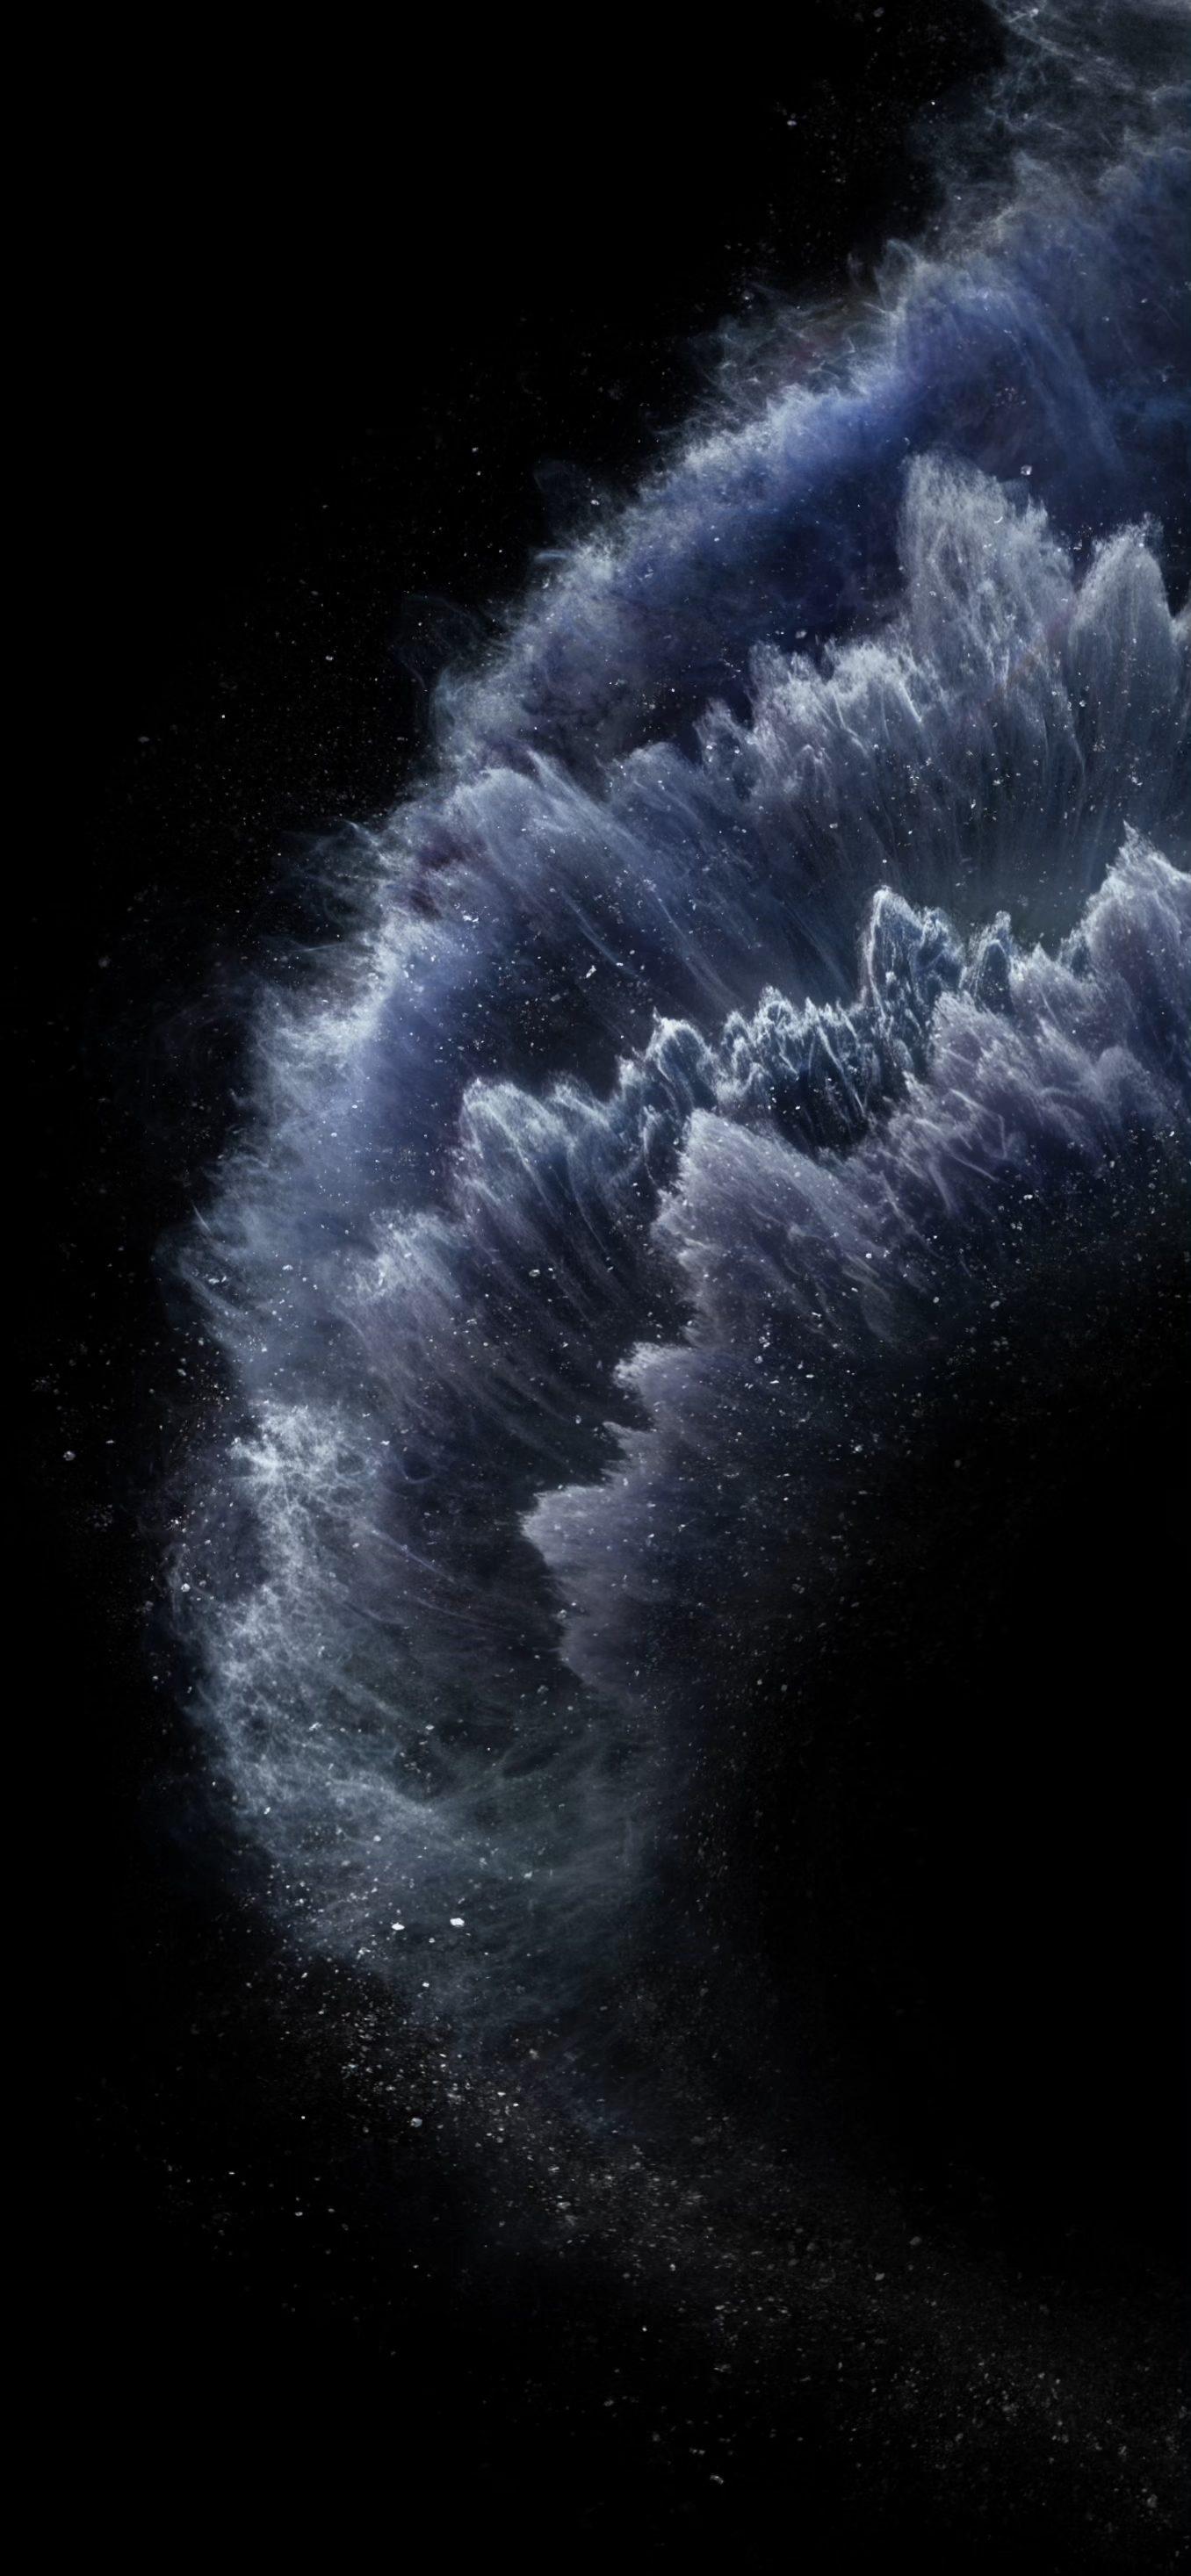 Iphone Dark Mode Wallpapers Wallpaper Cave